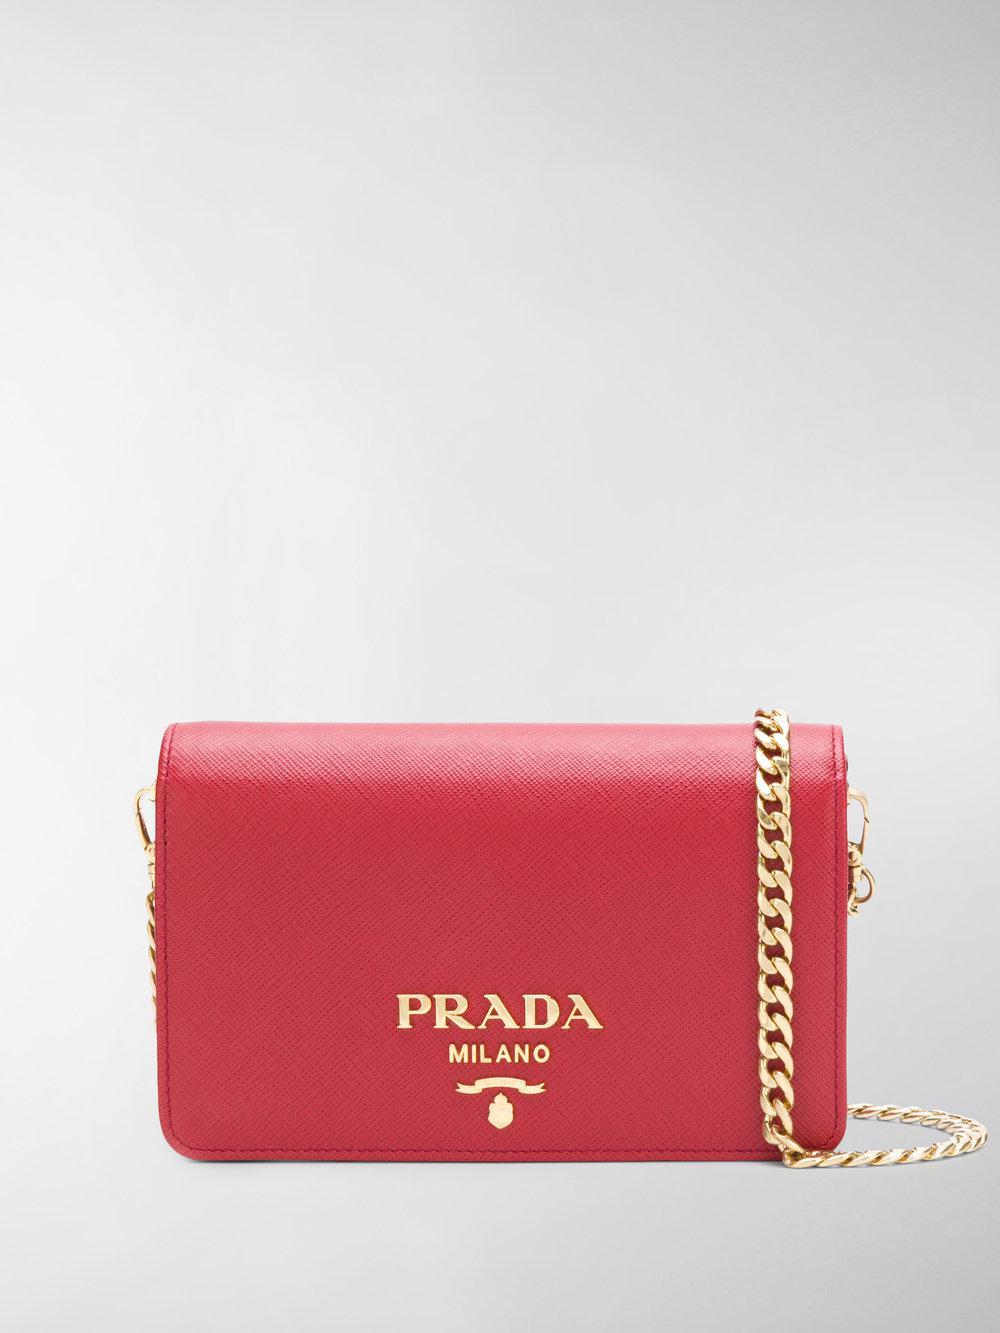 a8e9f22fbc7d Prada Saffiano Logo Shoulder Bag in Red - Save 41.01123595505618% - Lyst